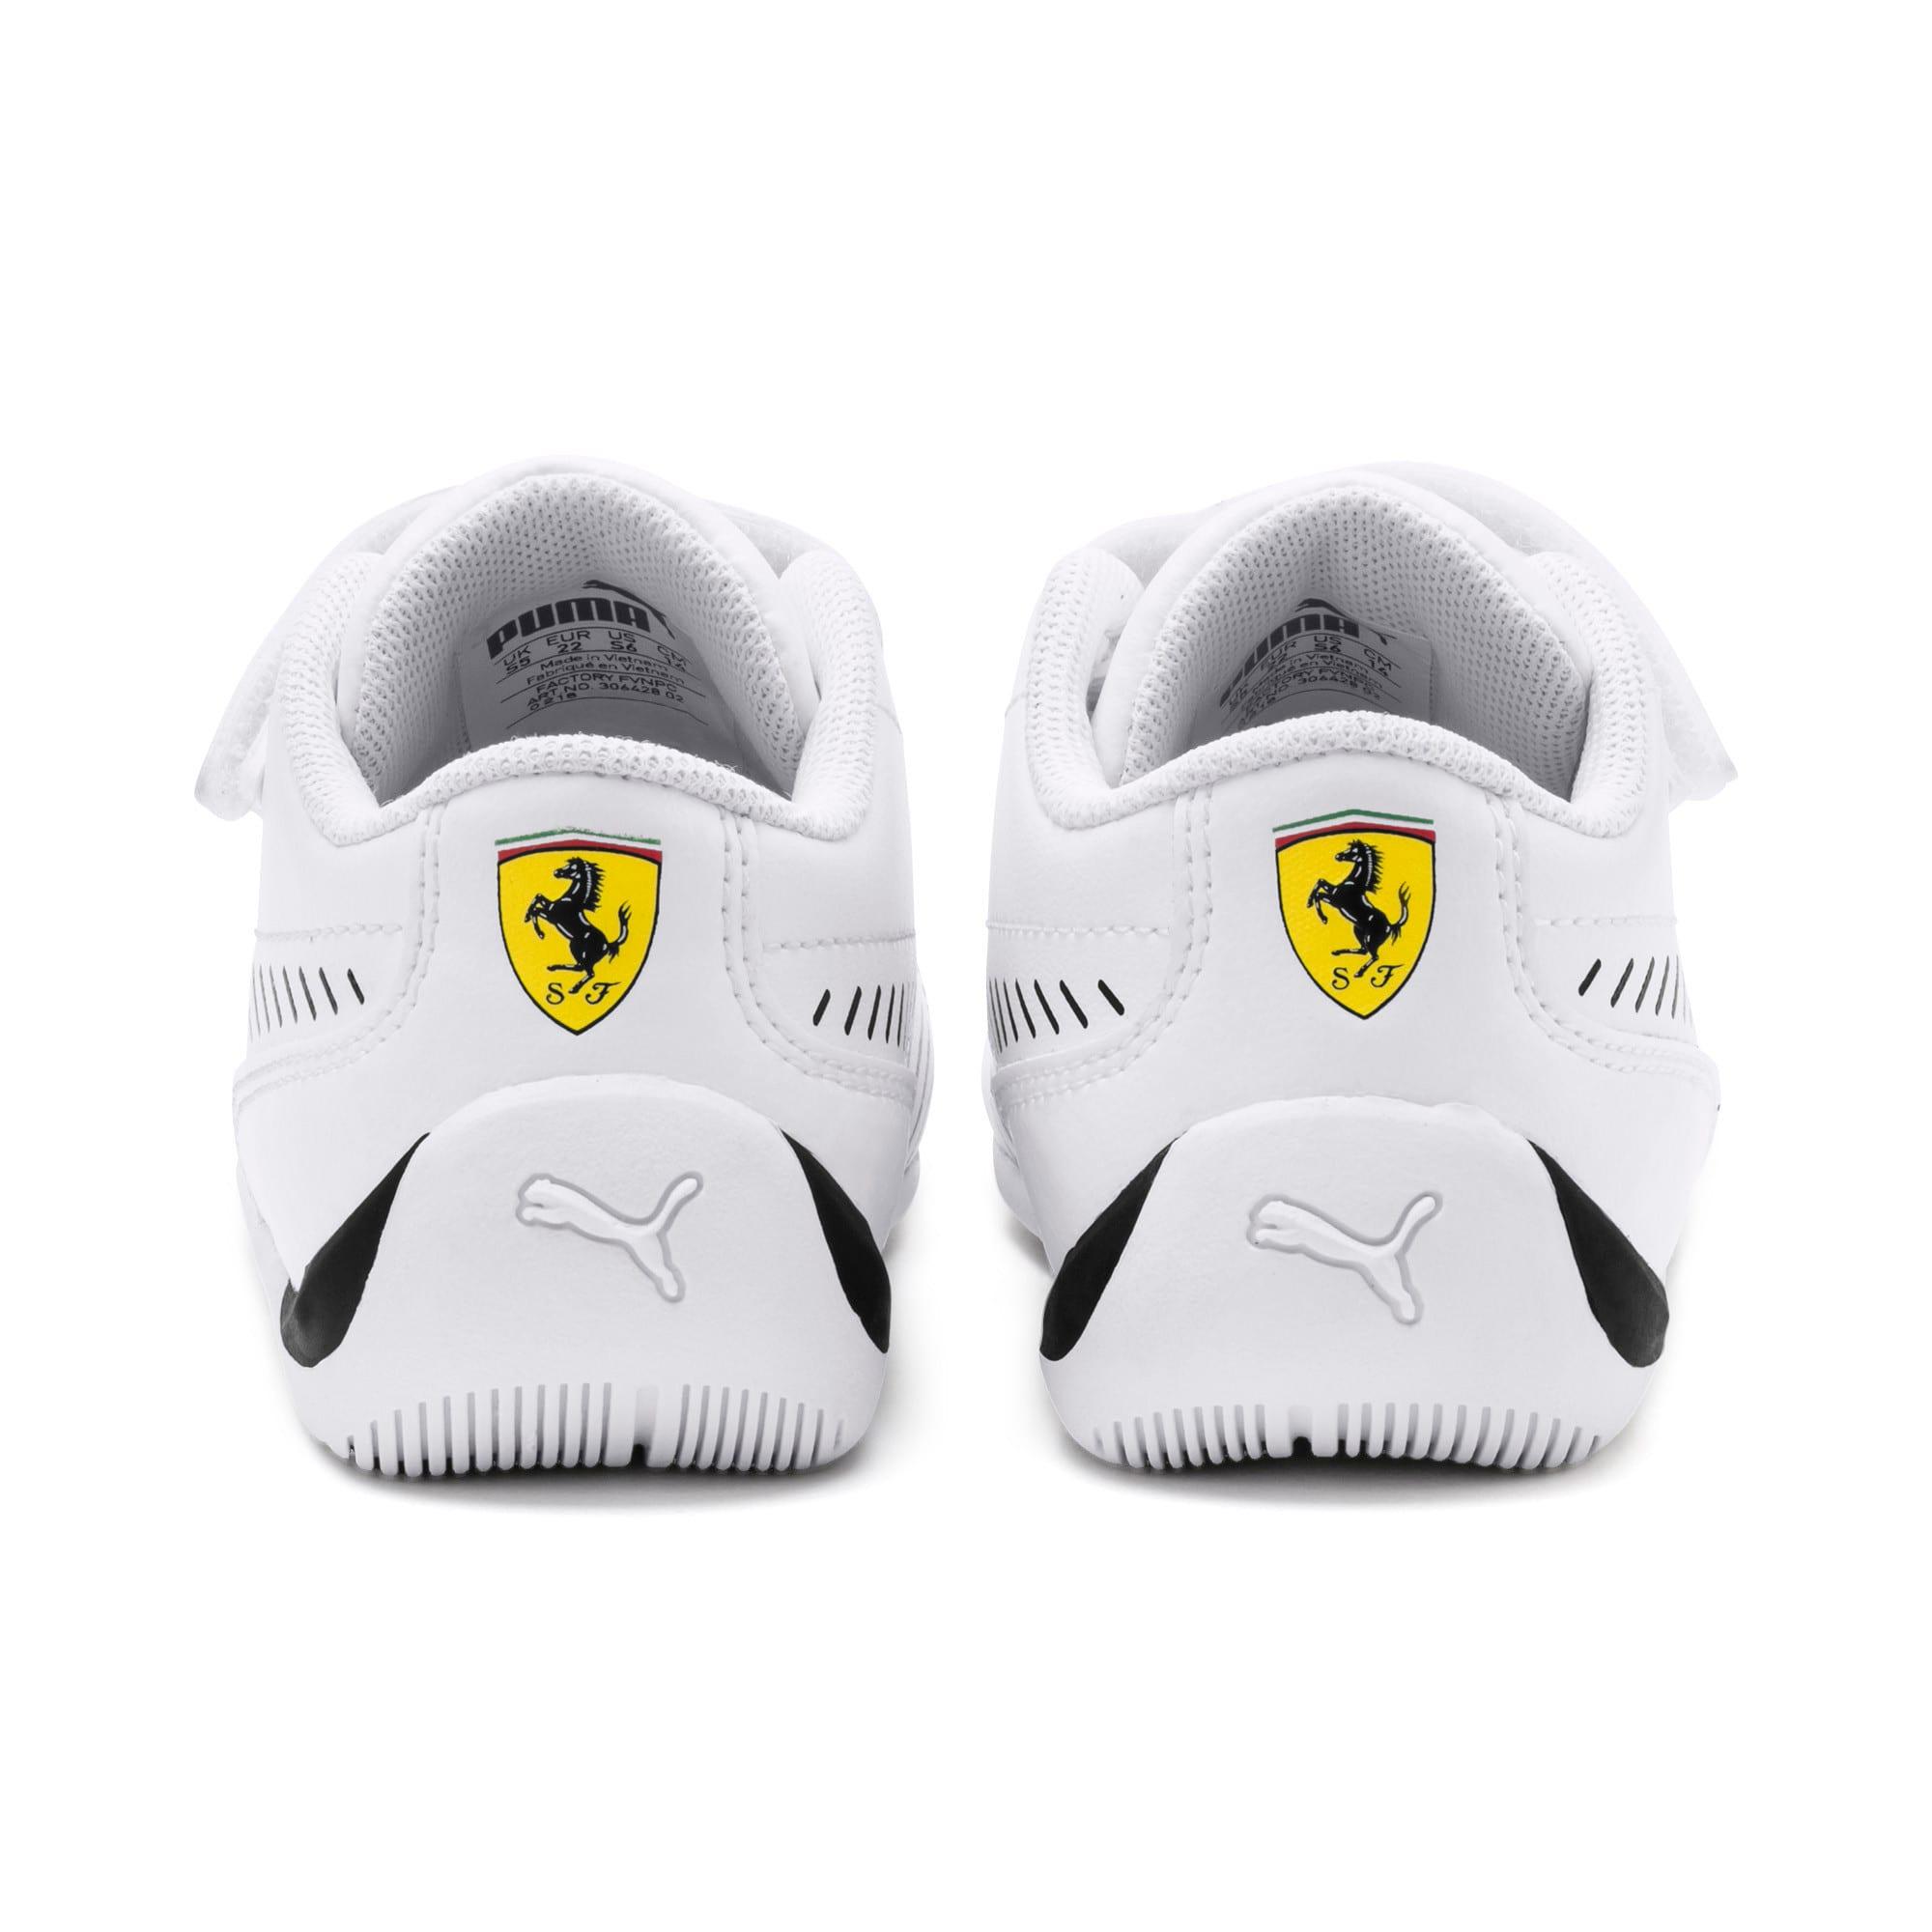 Thumbnail 3 of Scuderia Ferrari Drift Cat 7S Ultra Toddler Shoes, Puma White-Puma Black, medium